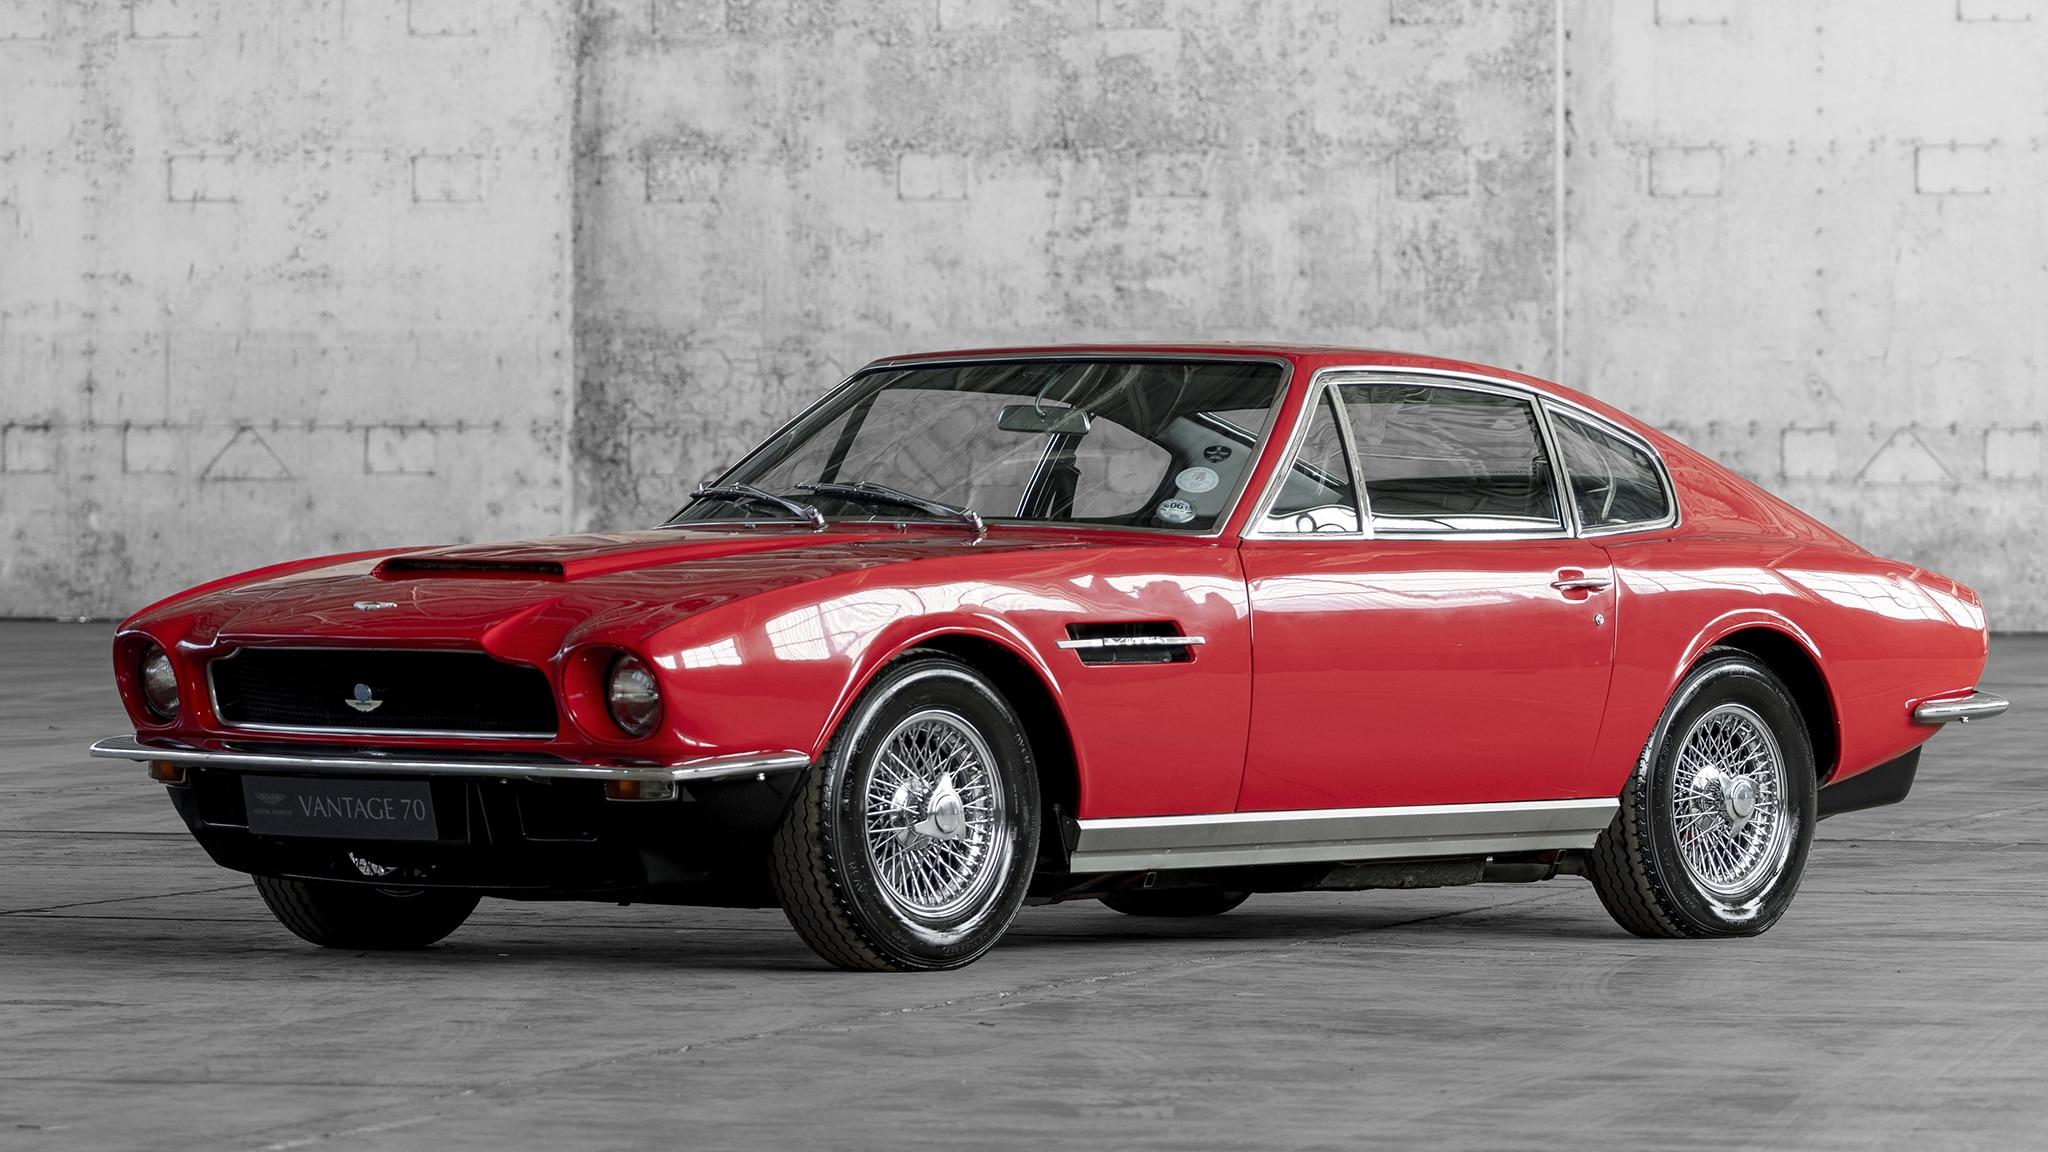 Aston Martin Vantage History Buying Tips Photos Etc Technology Shout